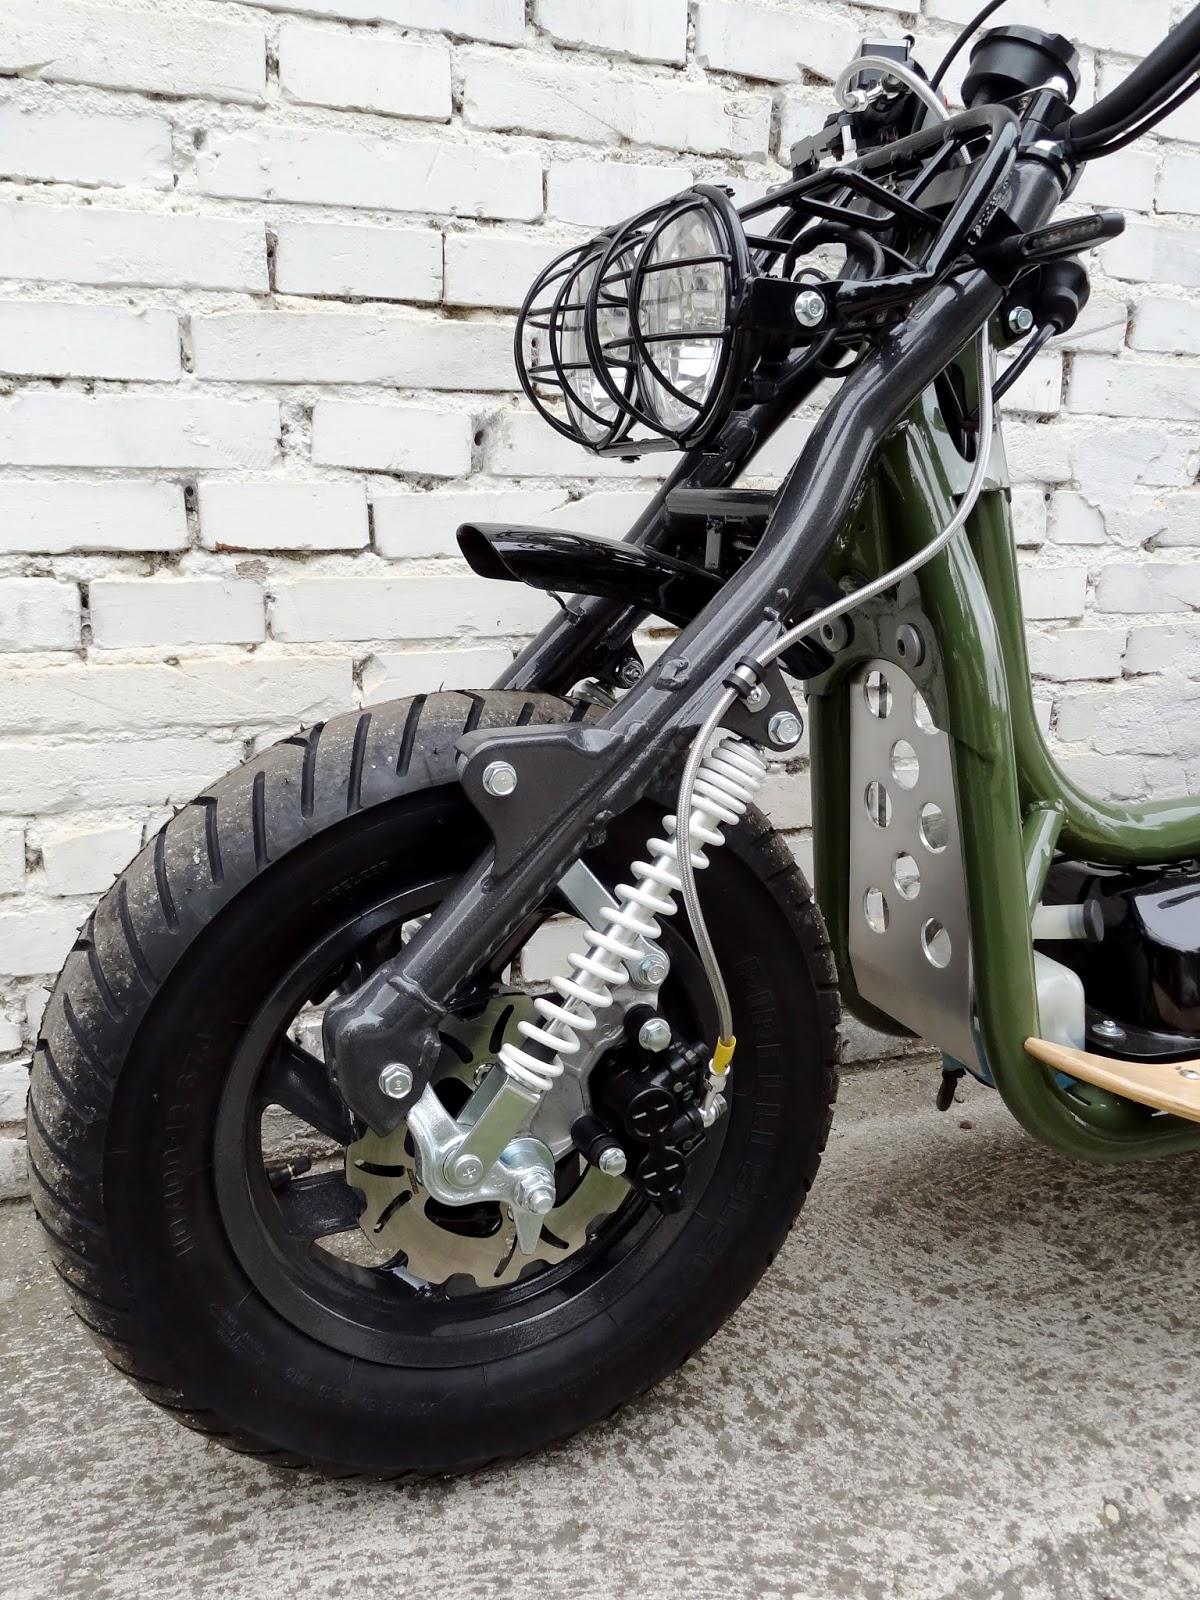 moto art. honda cn 250 wave military green edition br051 moto art